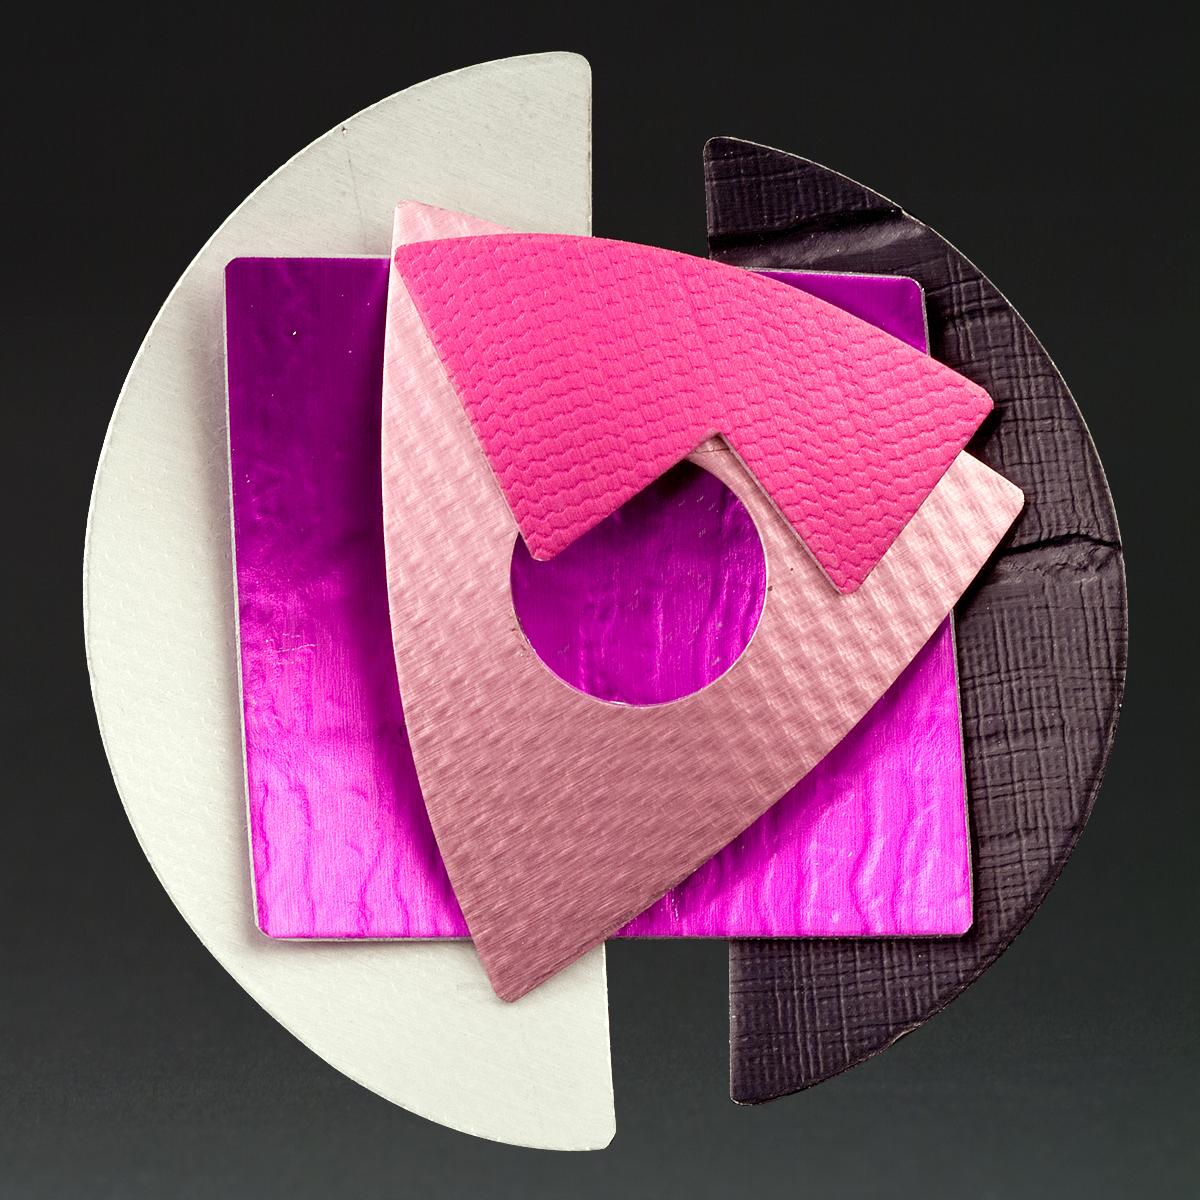 C - Silver, Violet, Pink, Berry, Black